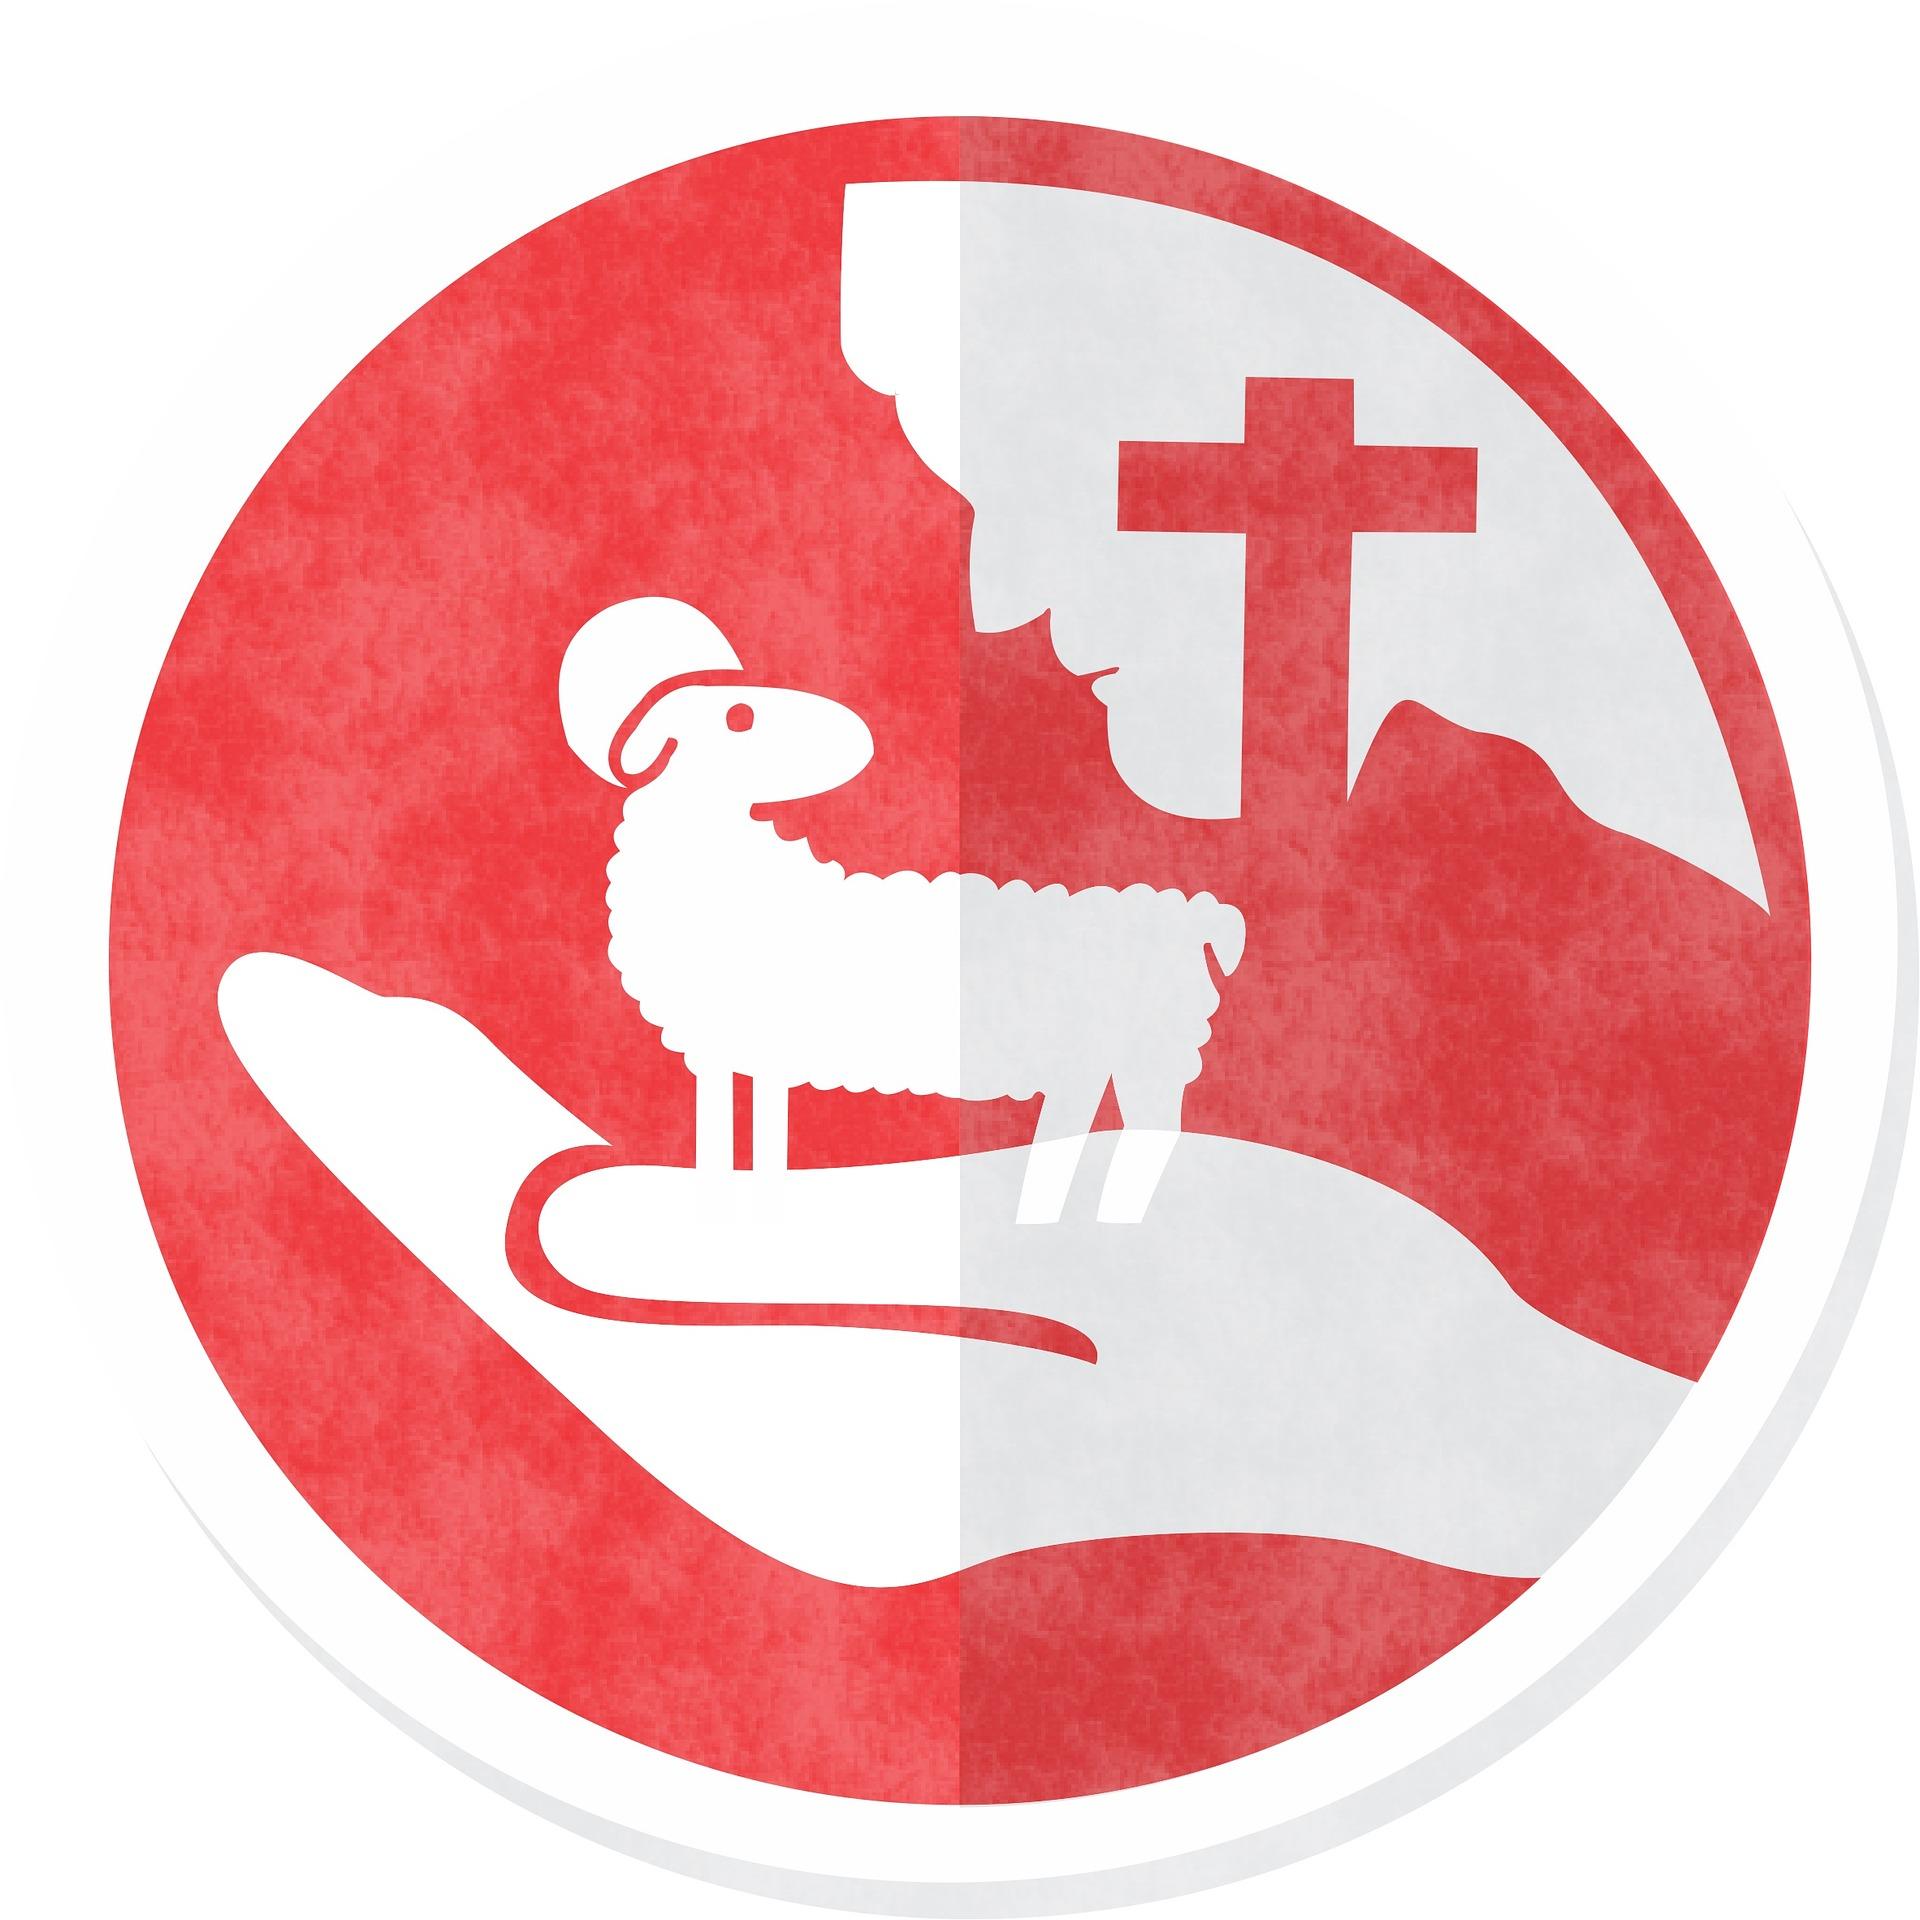 logo-1707005_1920